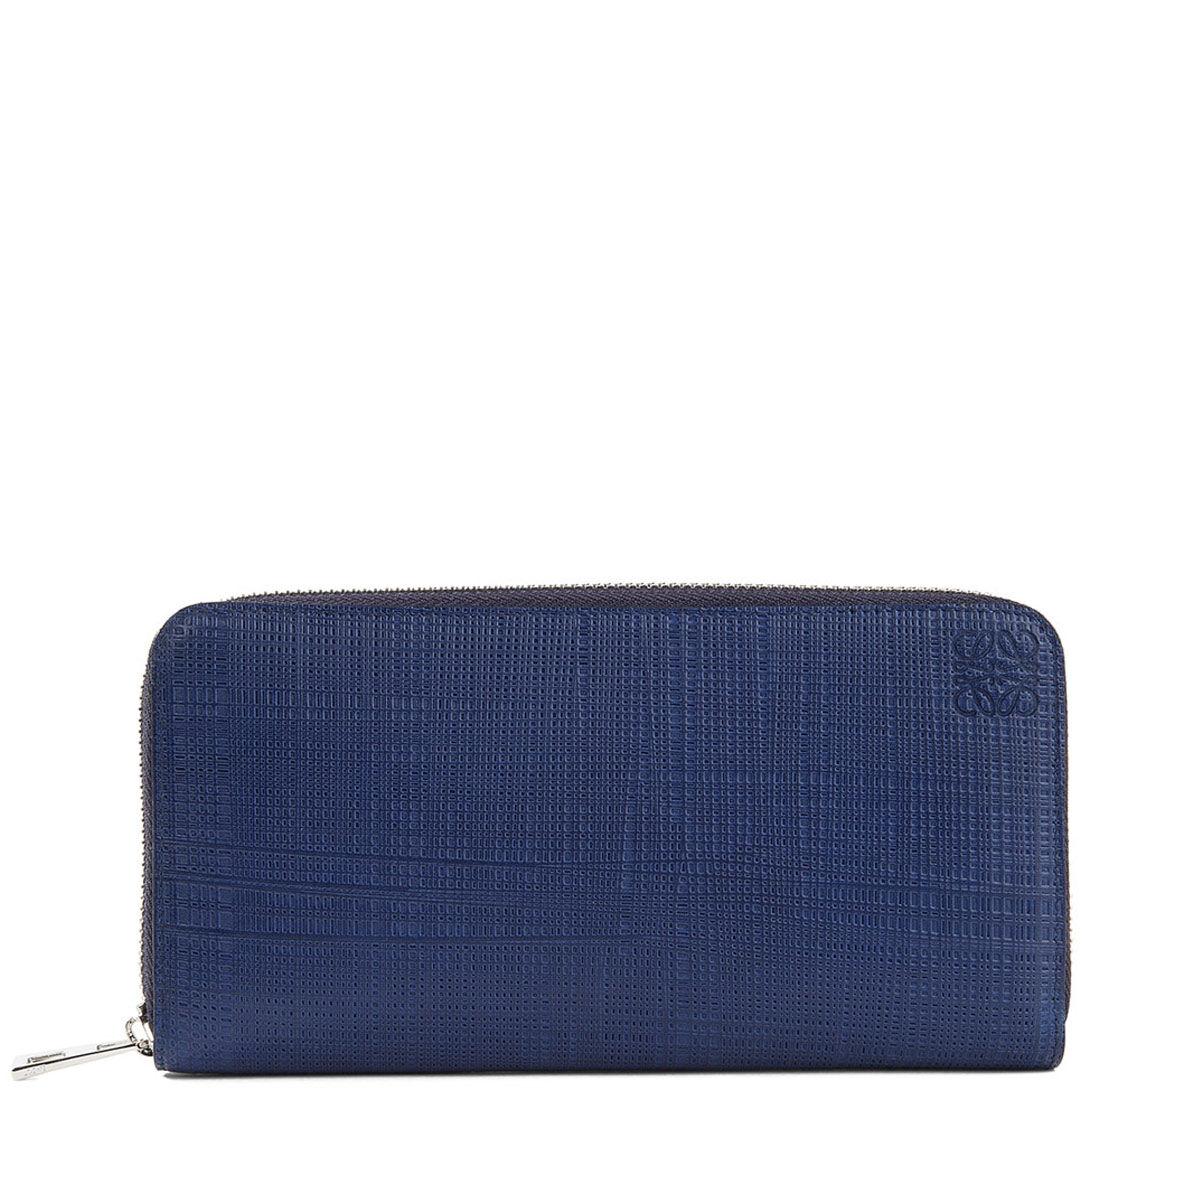 LOEWE Zip Around Wallet Navy Blue all